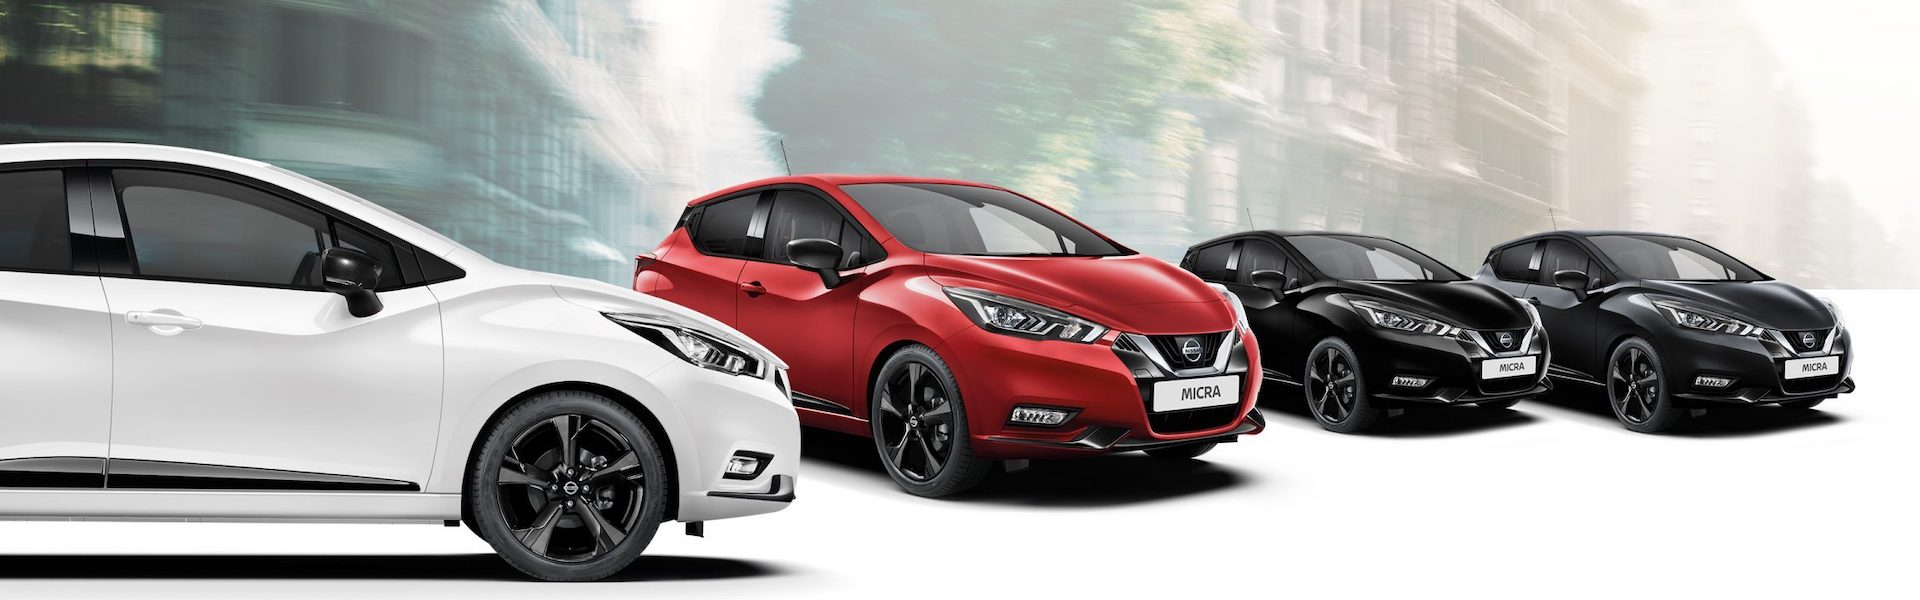 gama do Nissan Micra